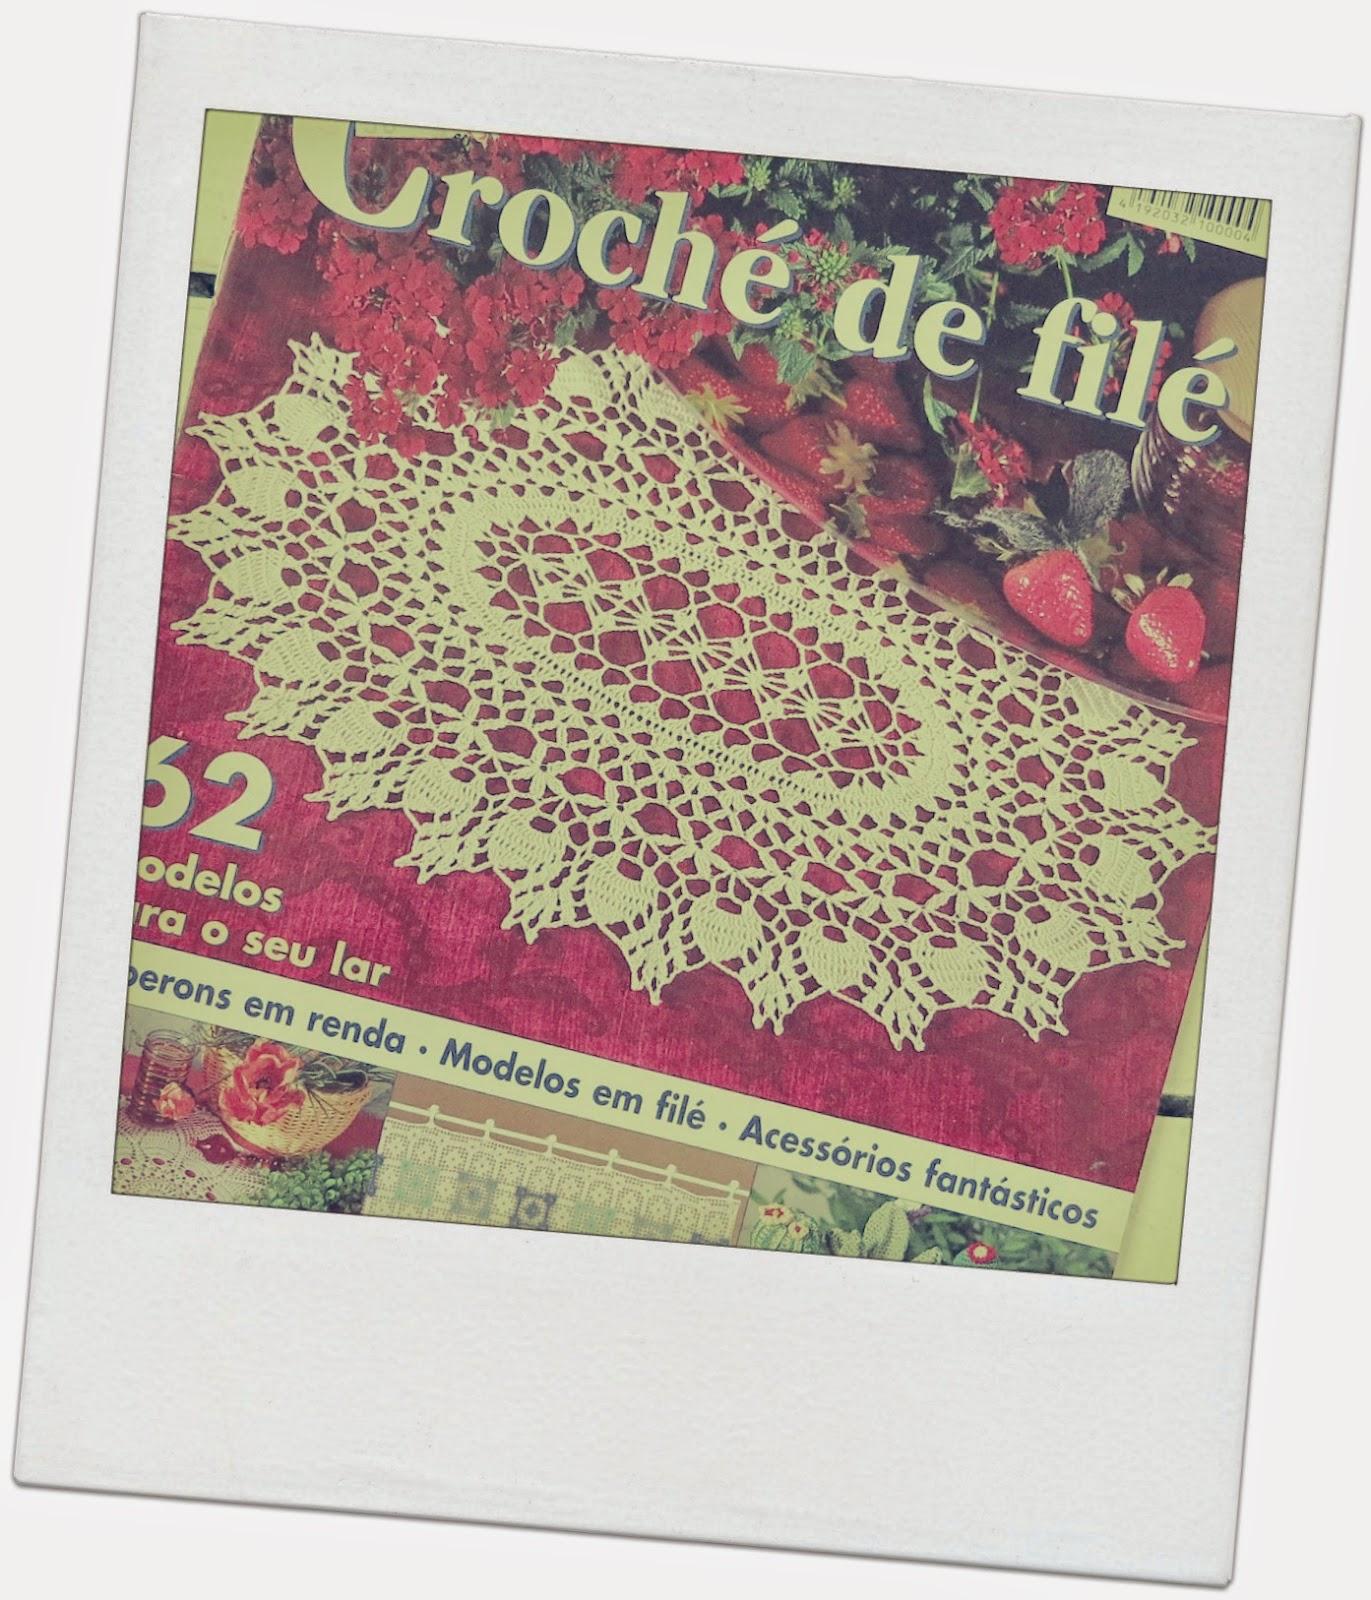 ByHaafner, Portuguese magazine, filet crochet